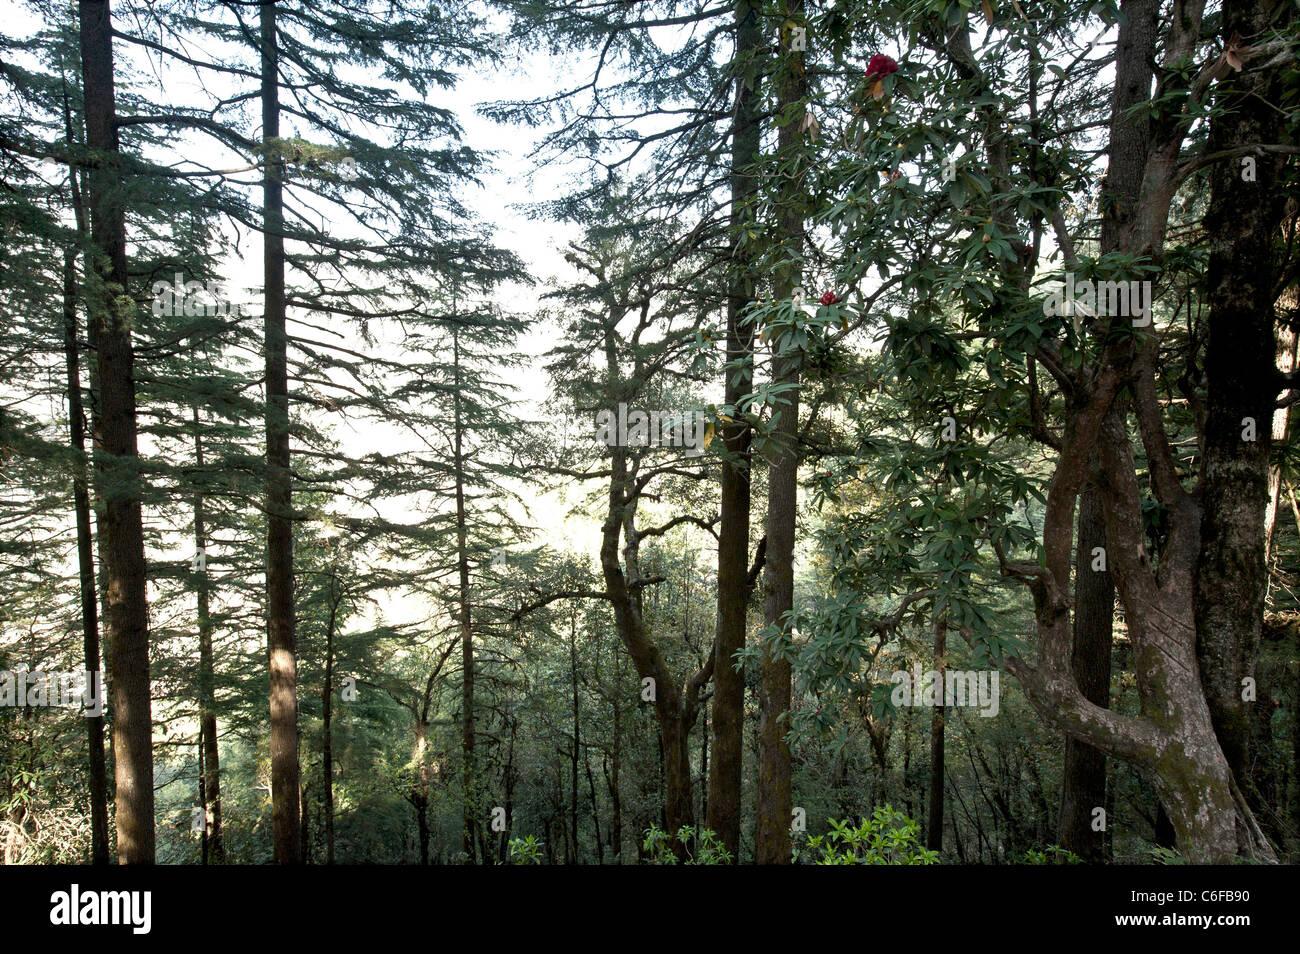 Pine tree forest at Dhanaulty -Uttarakhand-India. - Stock Image